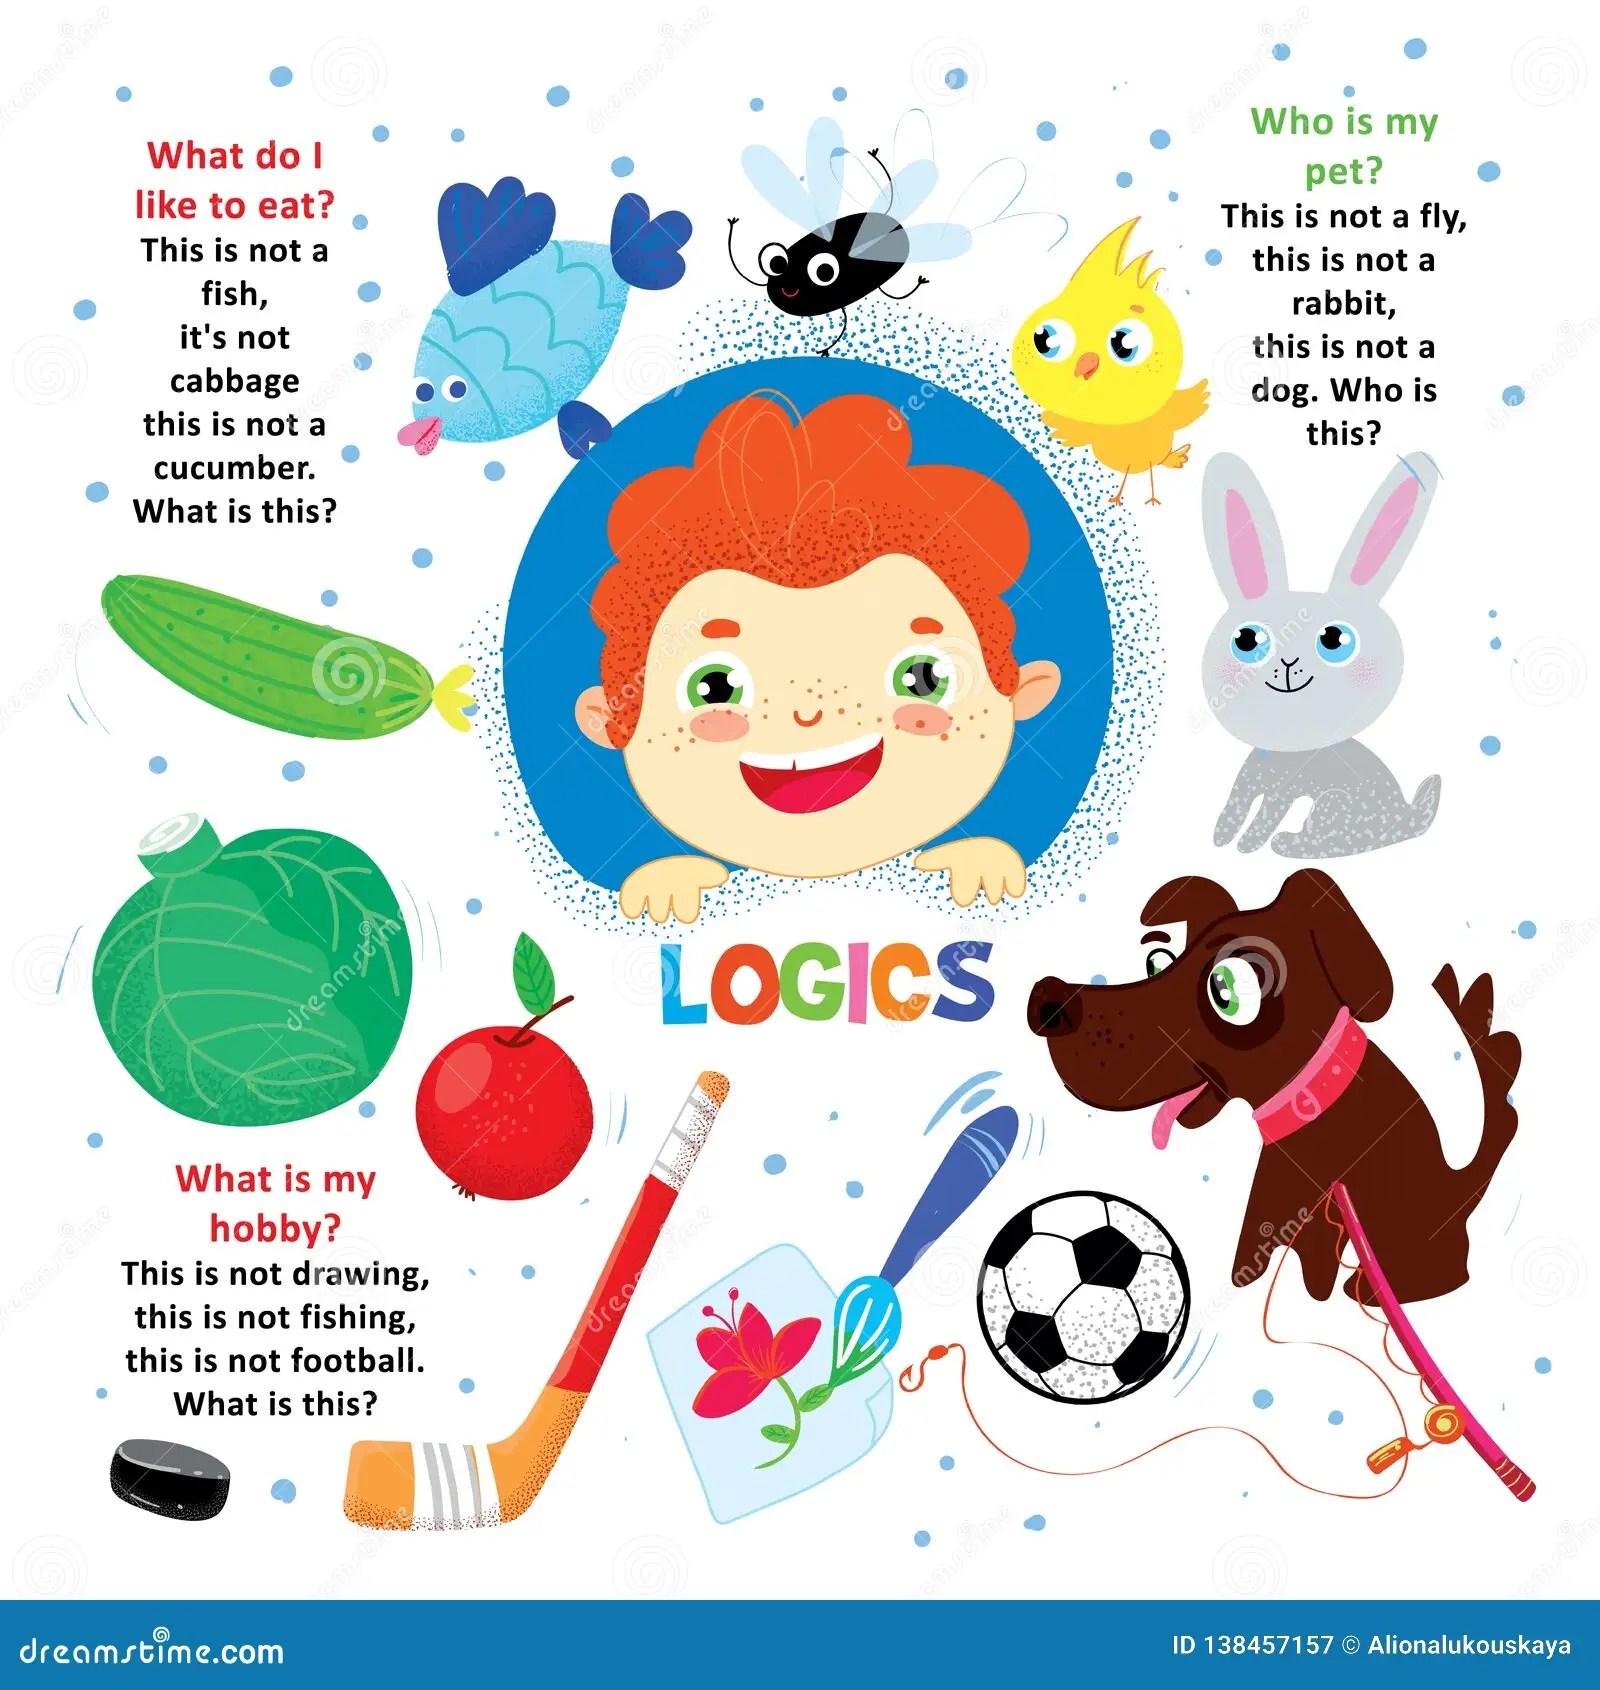 Logic Kid Question Game Printable Worksheet Cartoon Vector